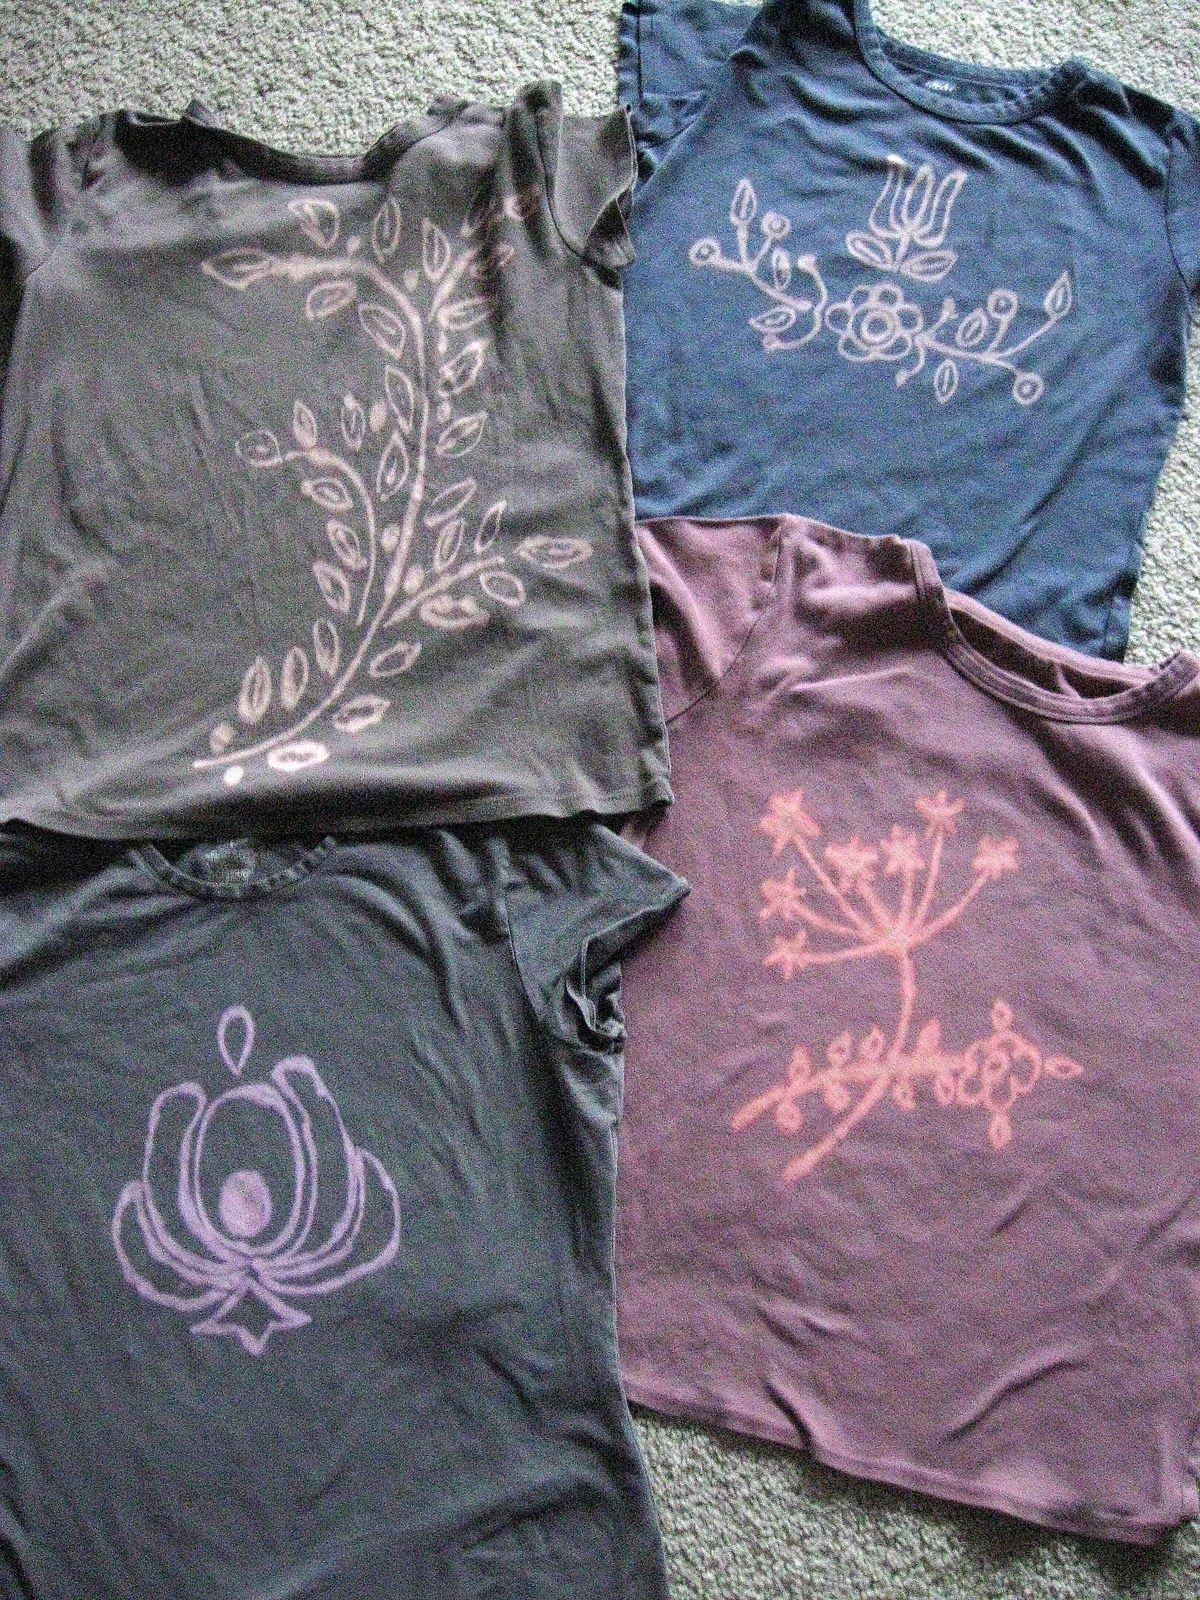 Shirt design using bleach - Go Back To School In Style Bleach Pen Shirtbleach